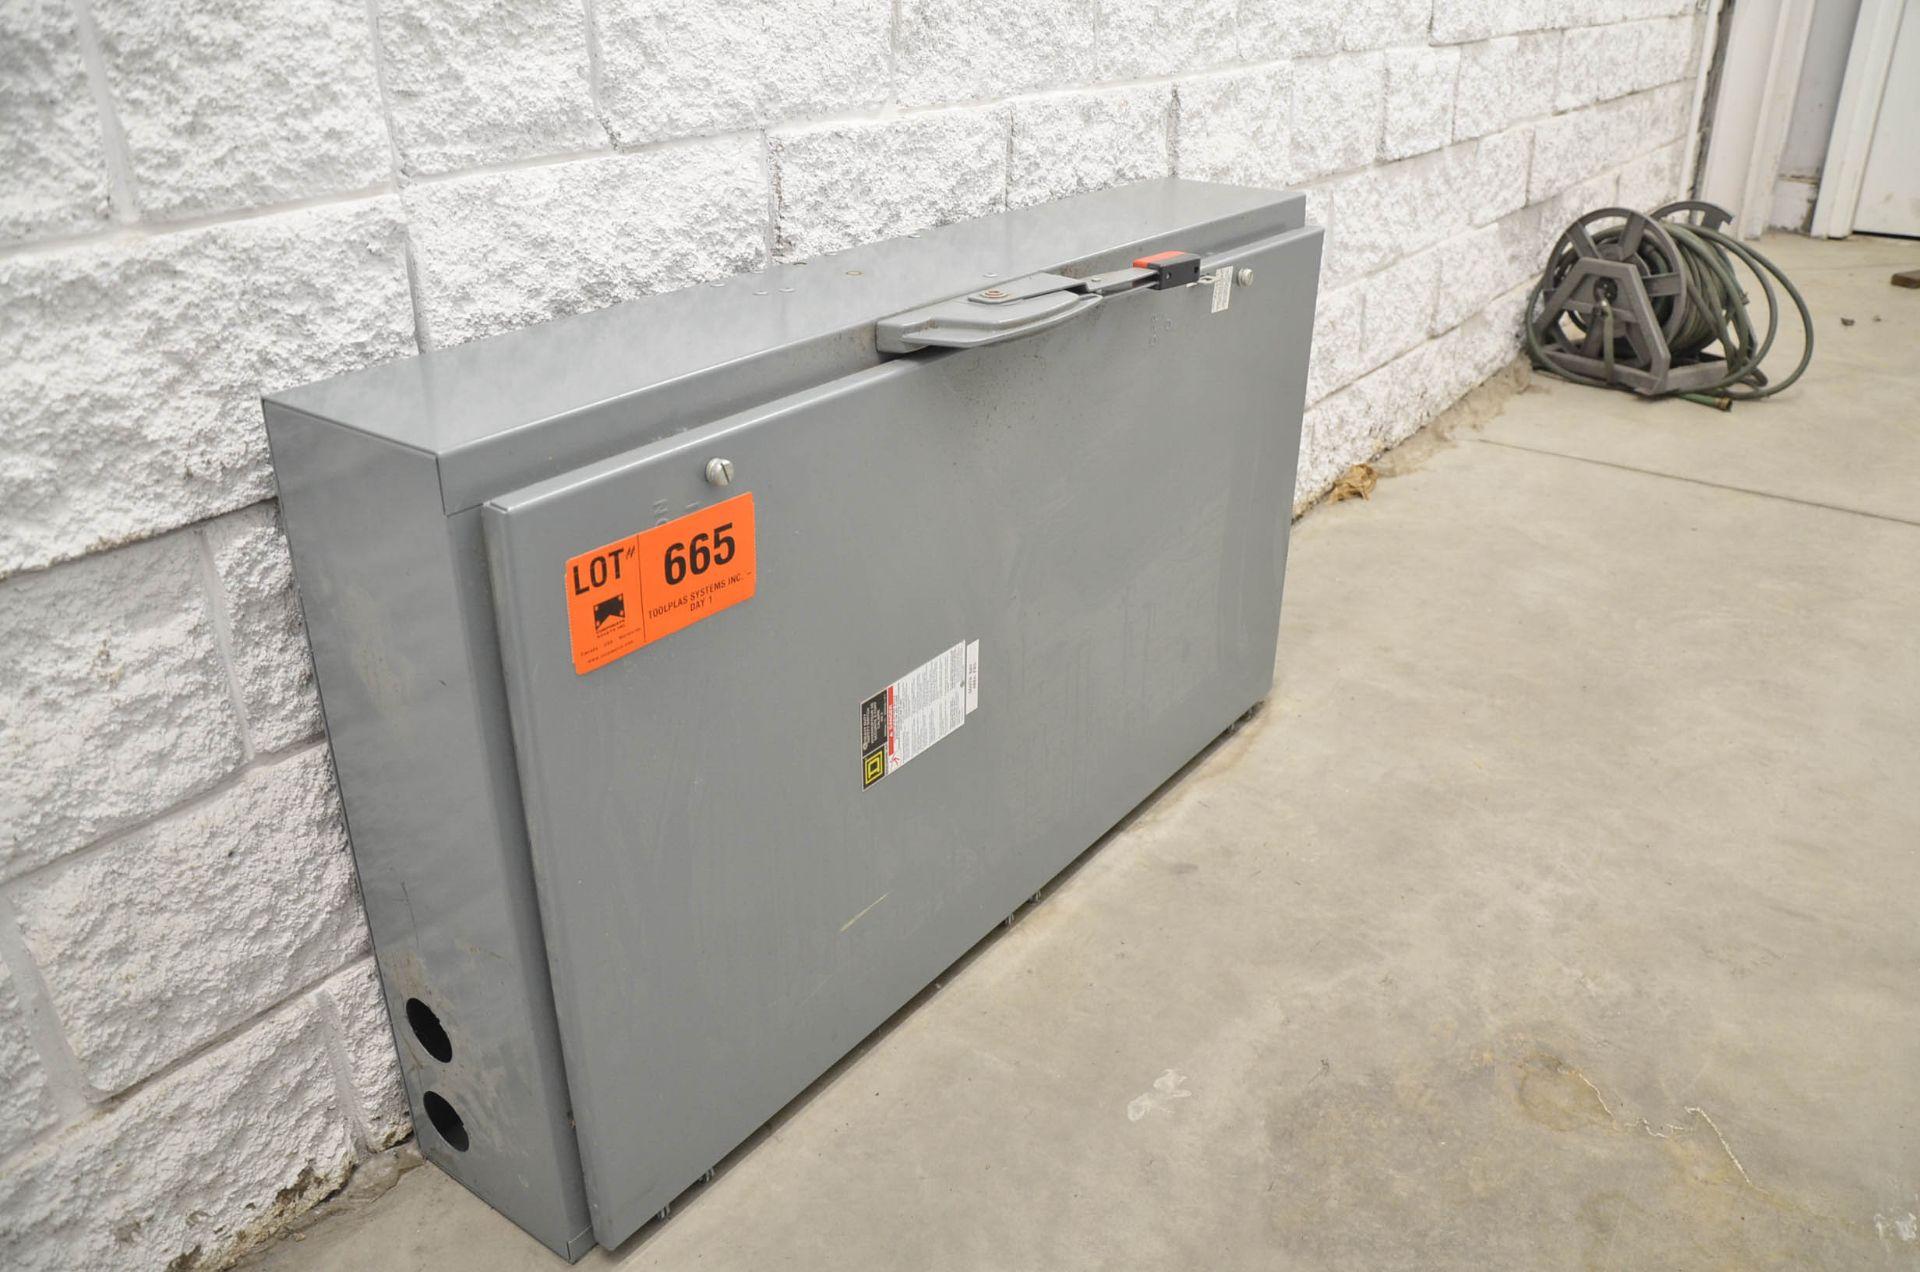 SQUARE -D 200 AMP DISCONNECT BOX